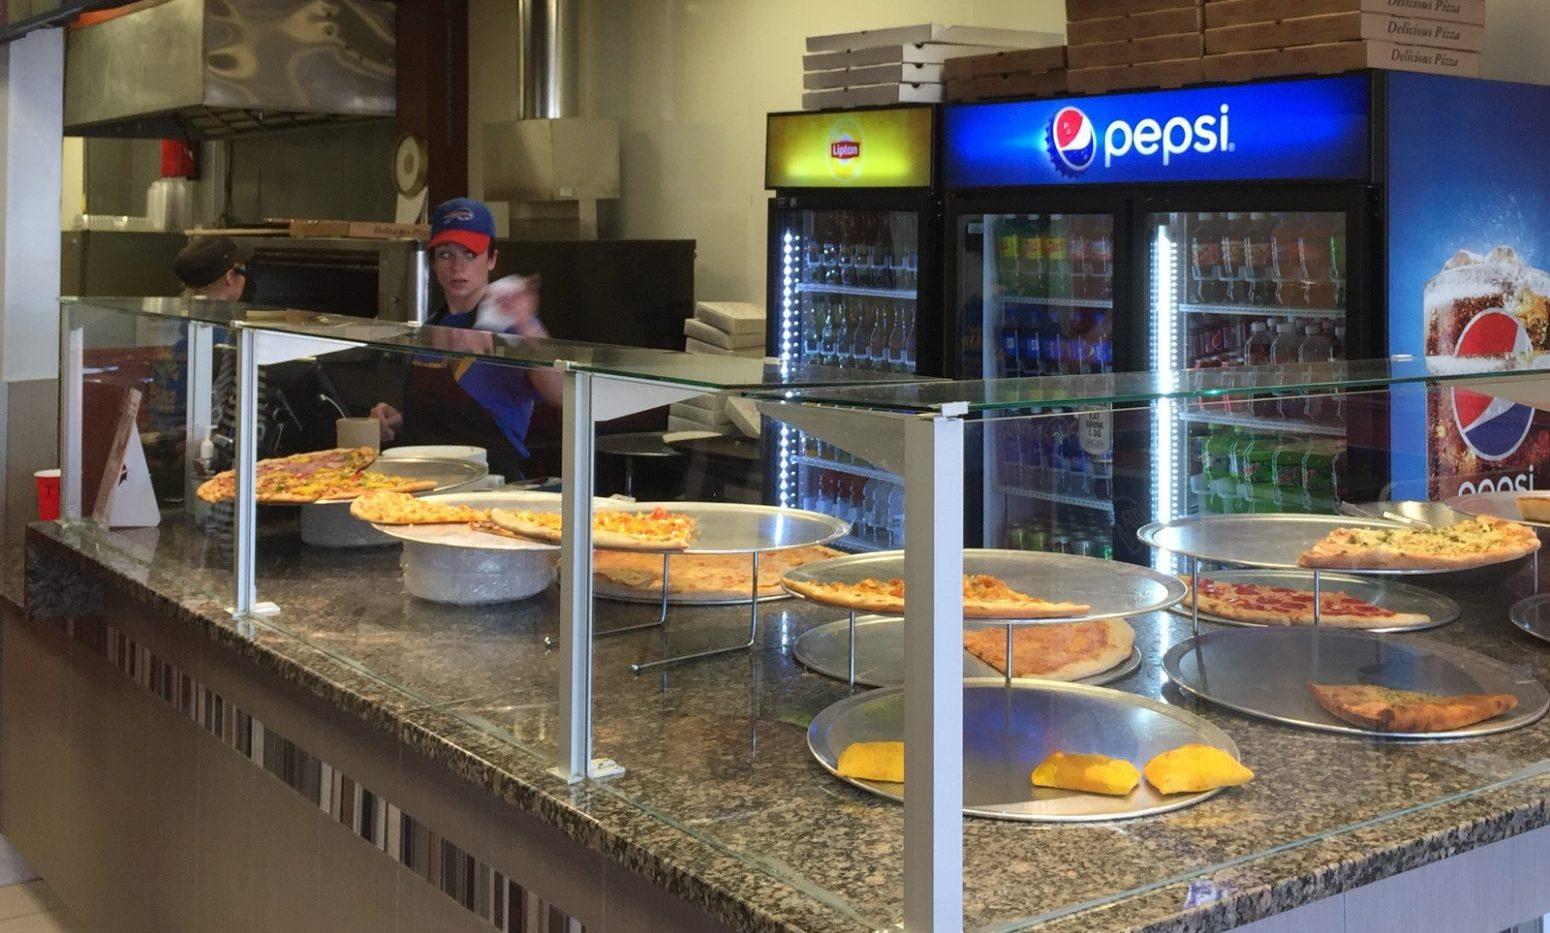 Pizzamaker from Albania opens store across Main Street from the University at Buffalo's Main Street campus. (Andrew Galarneau/Buffalo News)